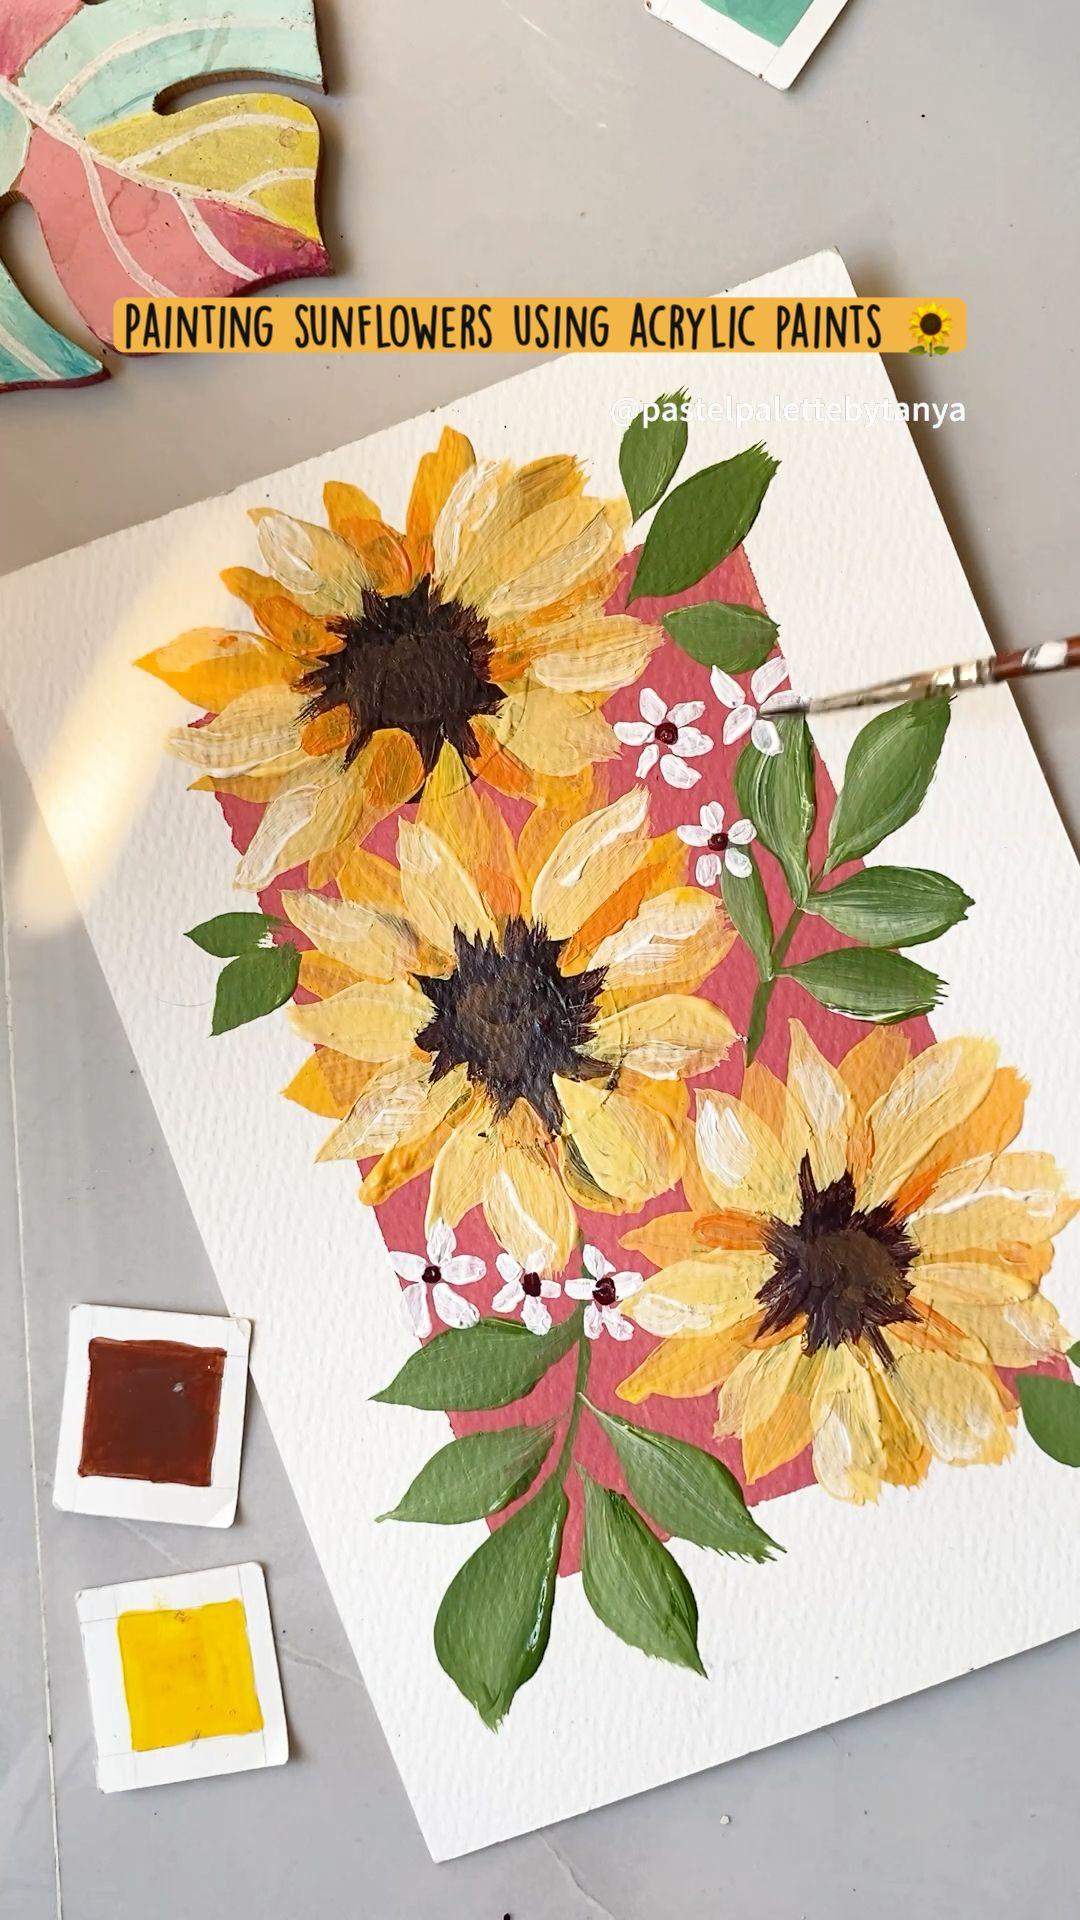 Painting sunflowers using acrylic paints 🌻